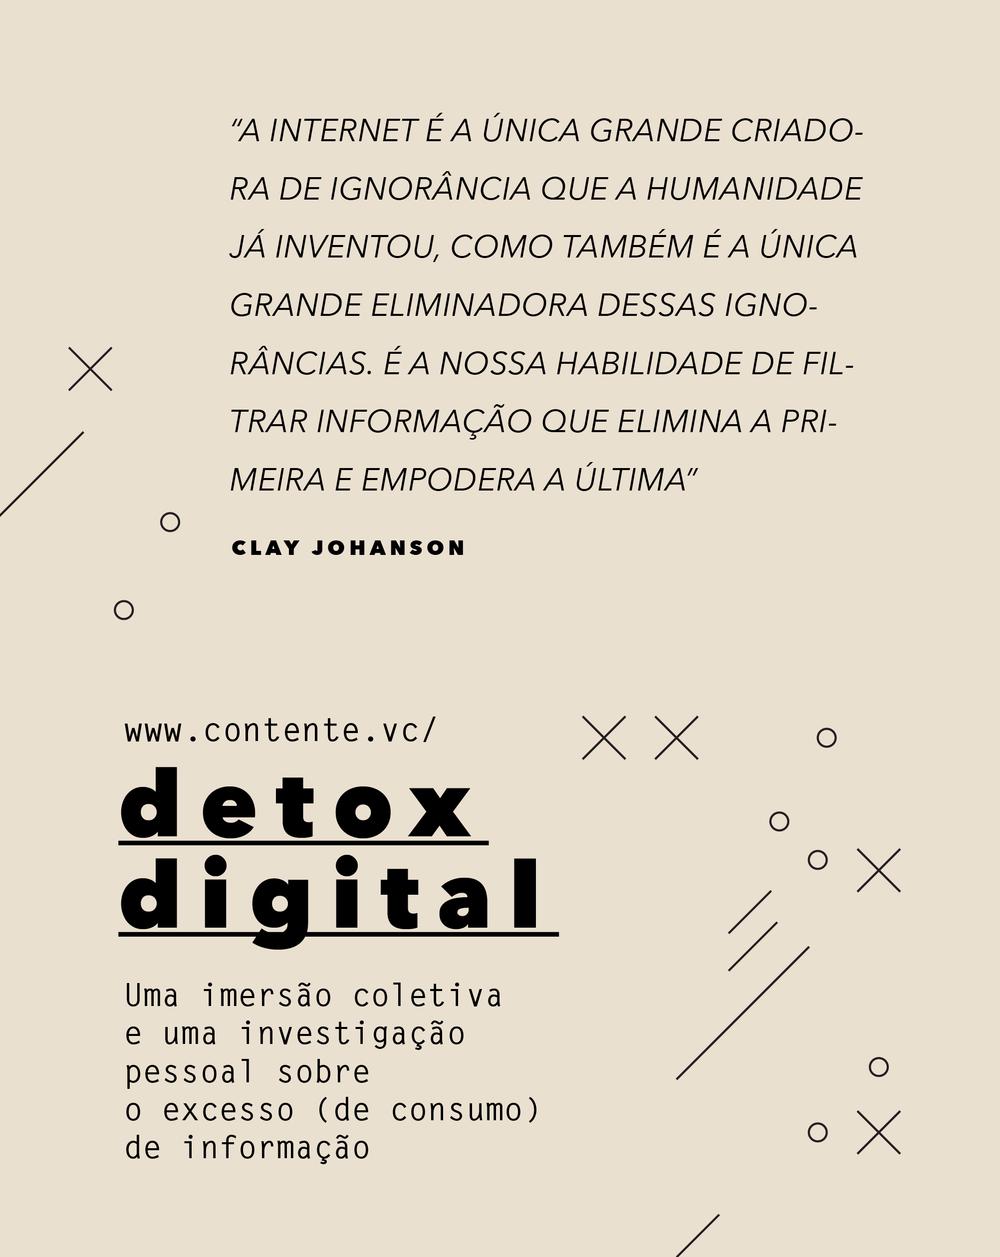 dettoxdigital-08.png